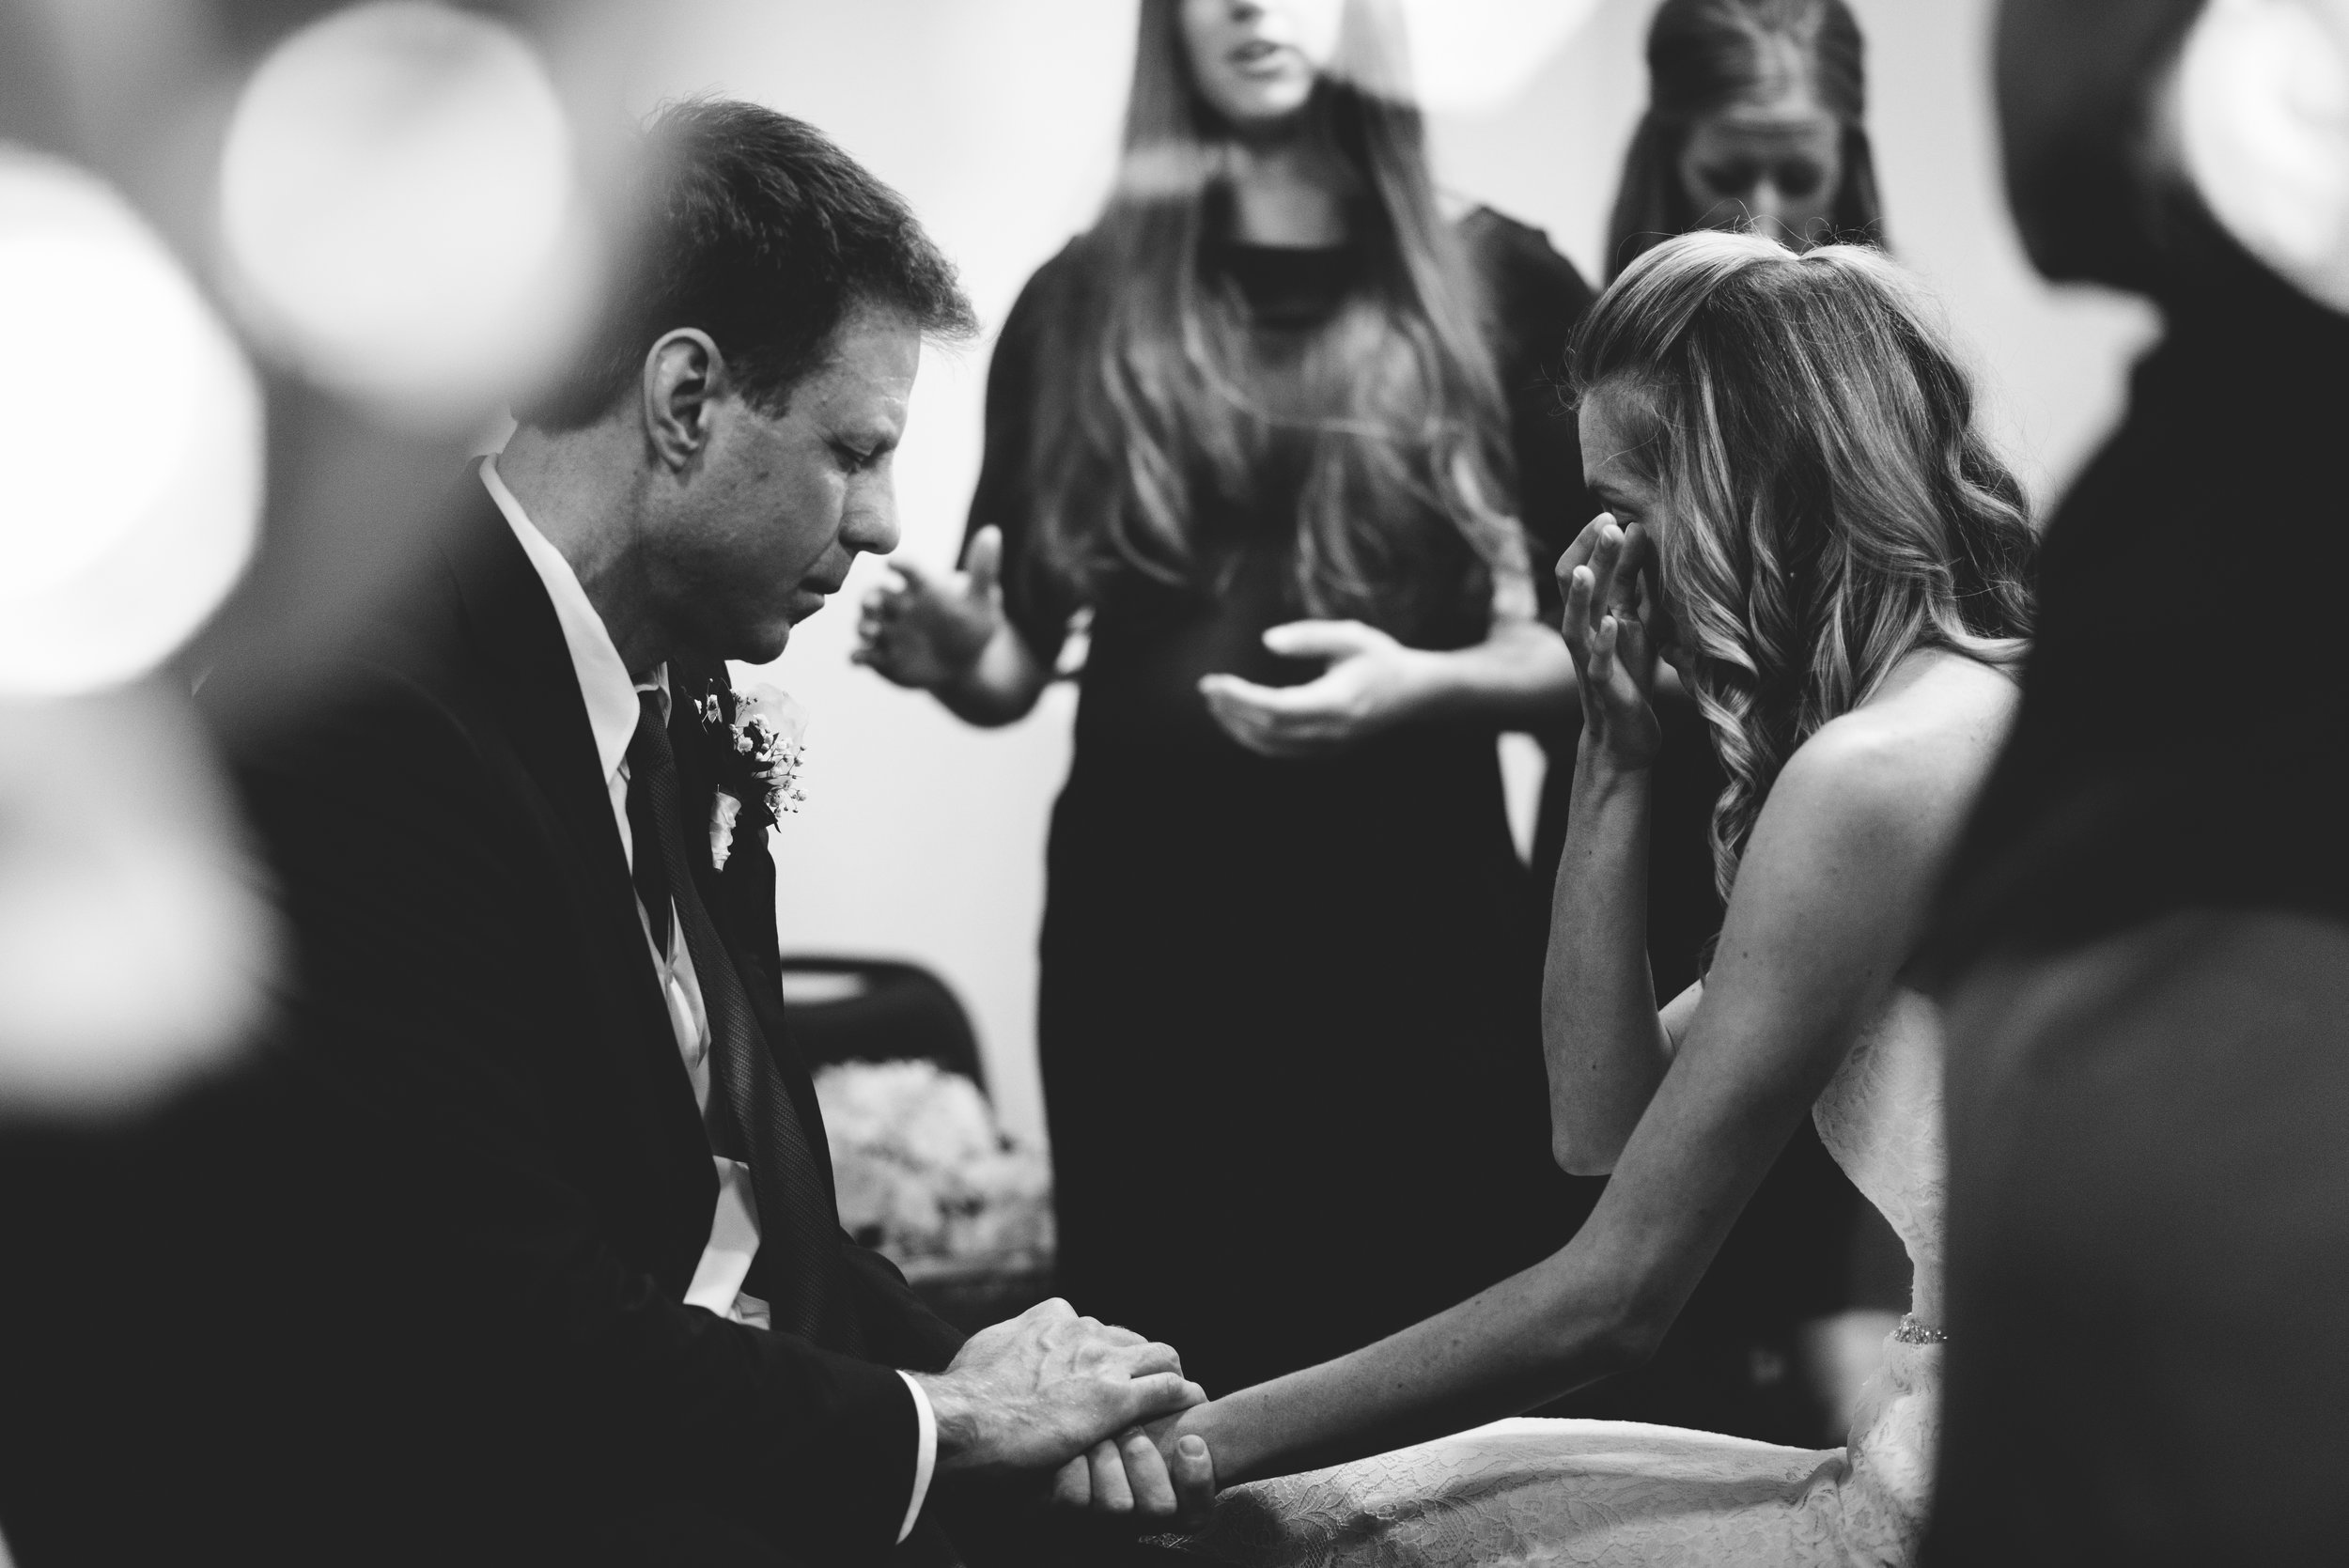 Des-Moines-Wedding-Blog-Kayla-Jeff-35.jpg